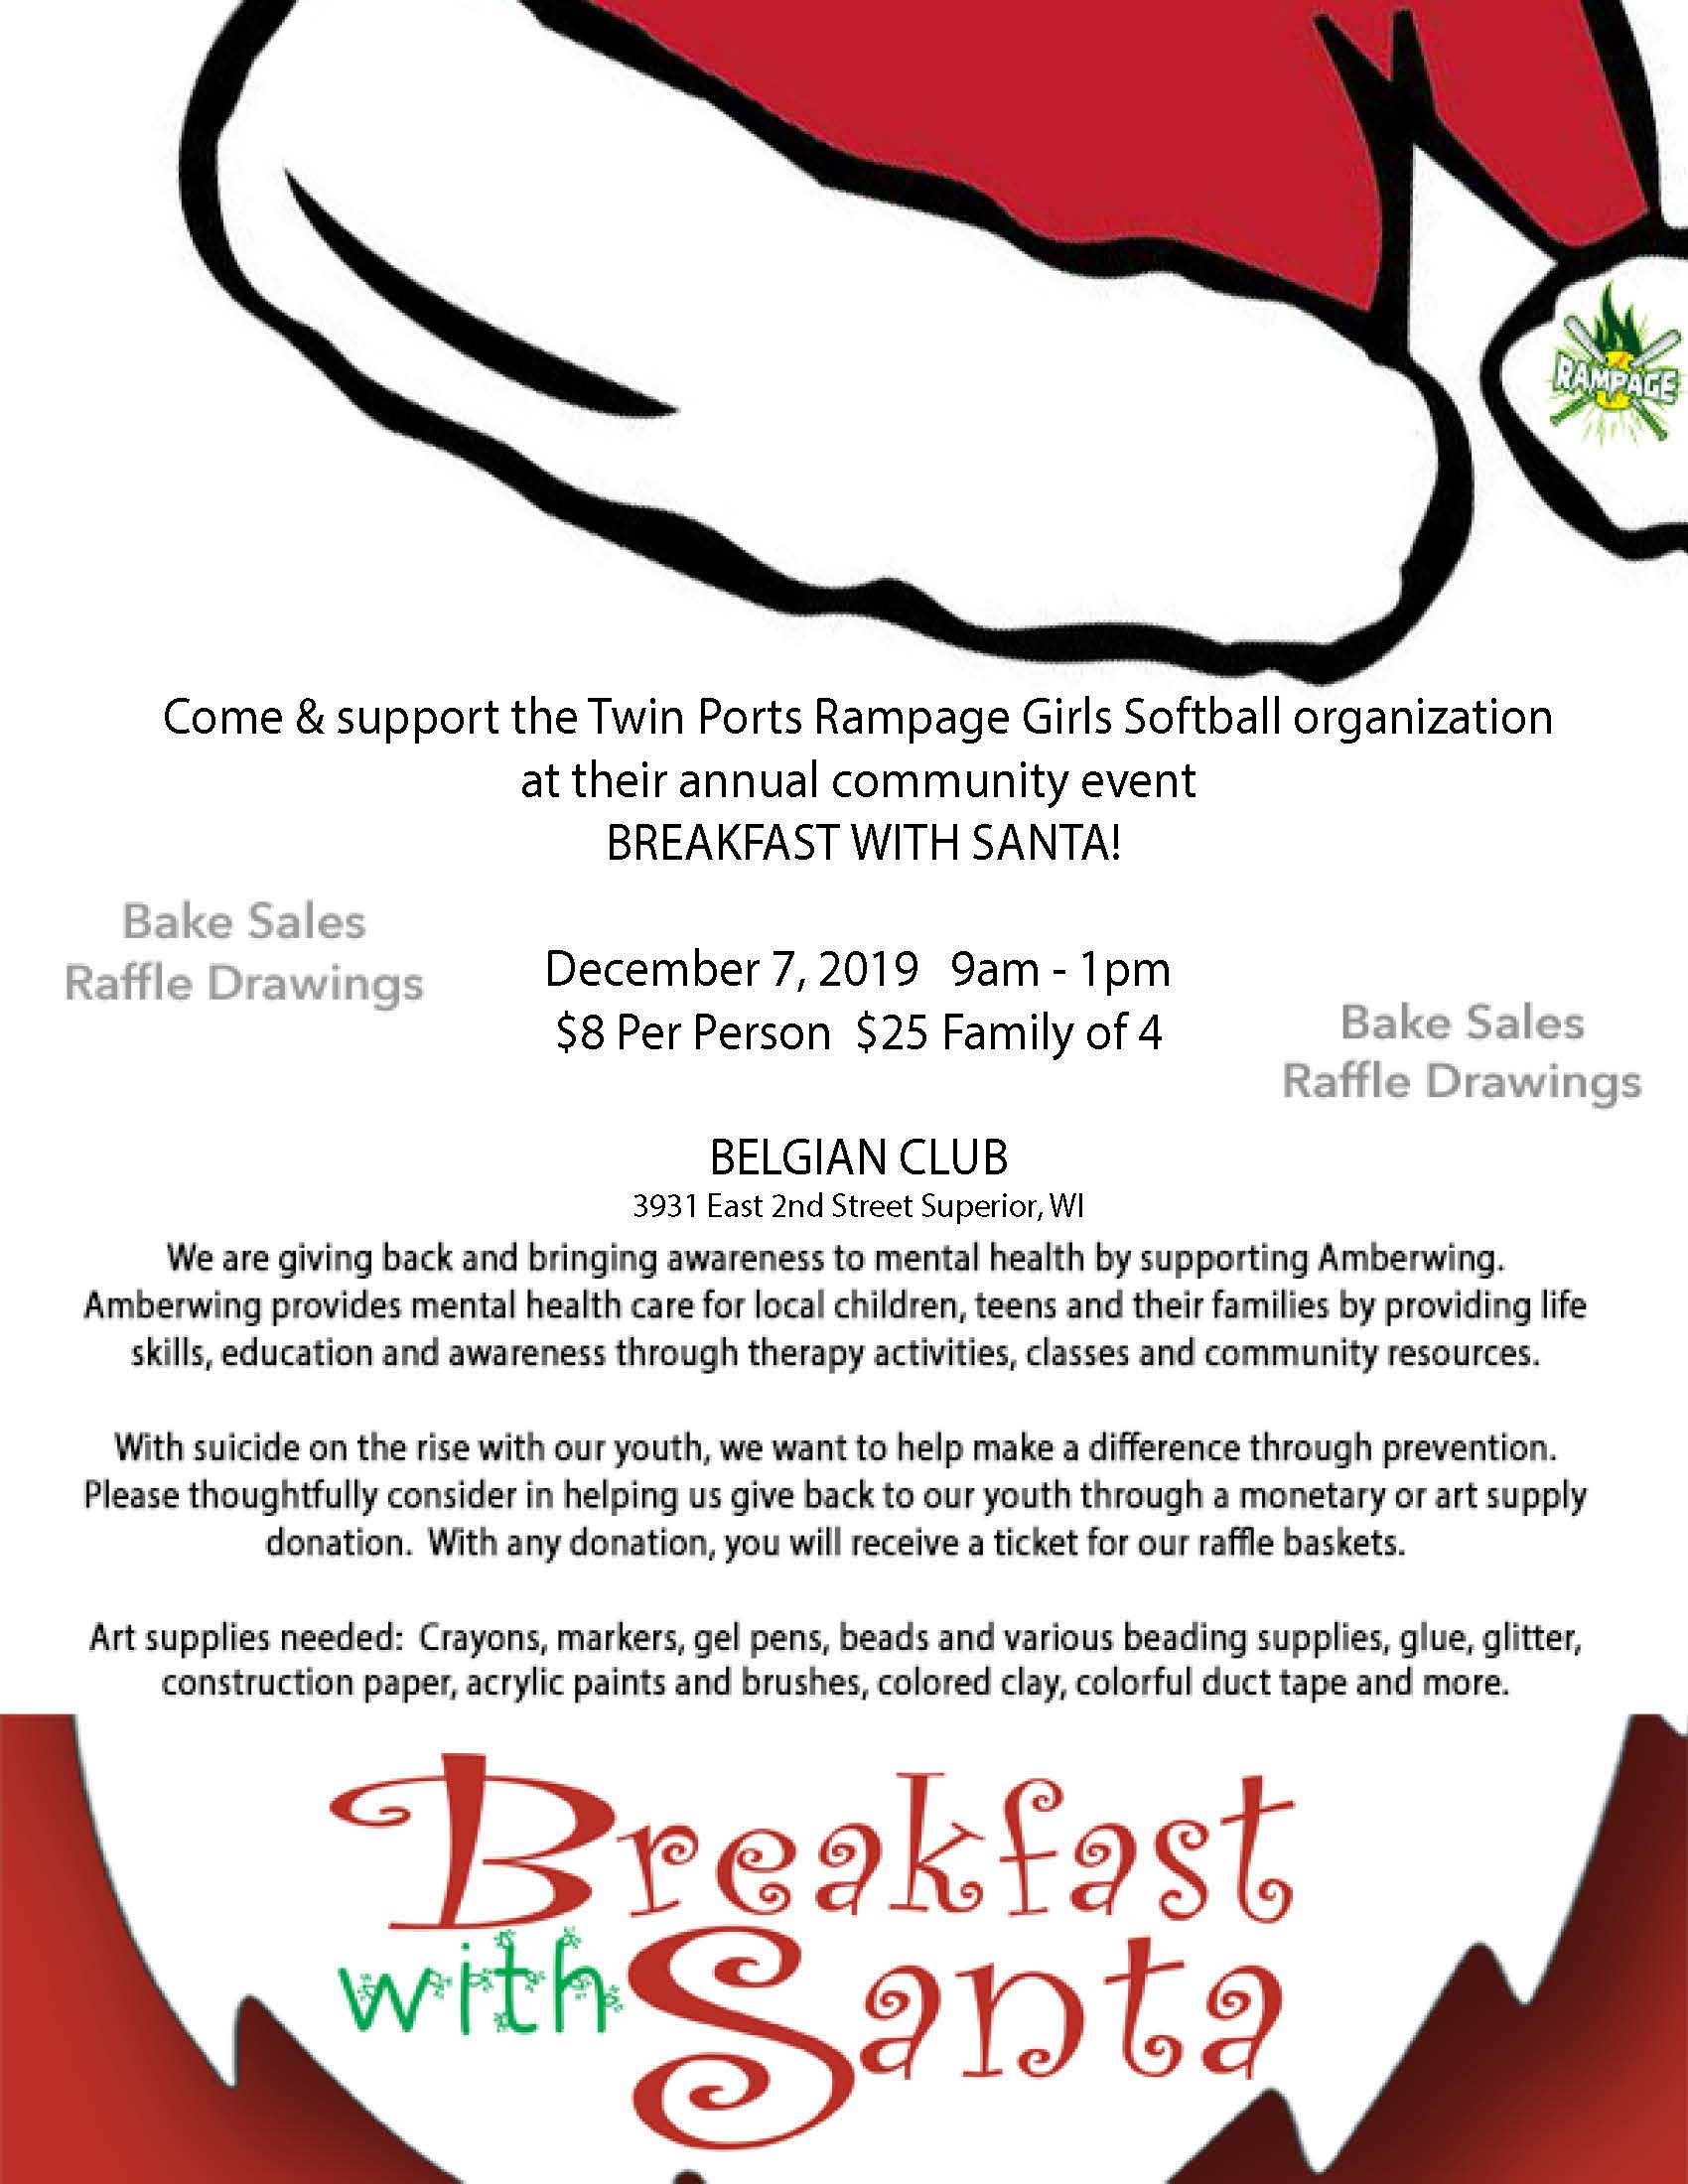 Breakfast with Santa Fundraiser Flyer